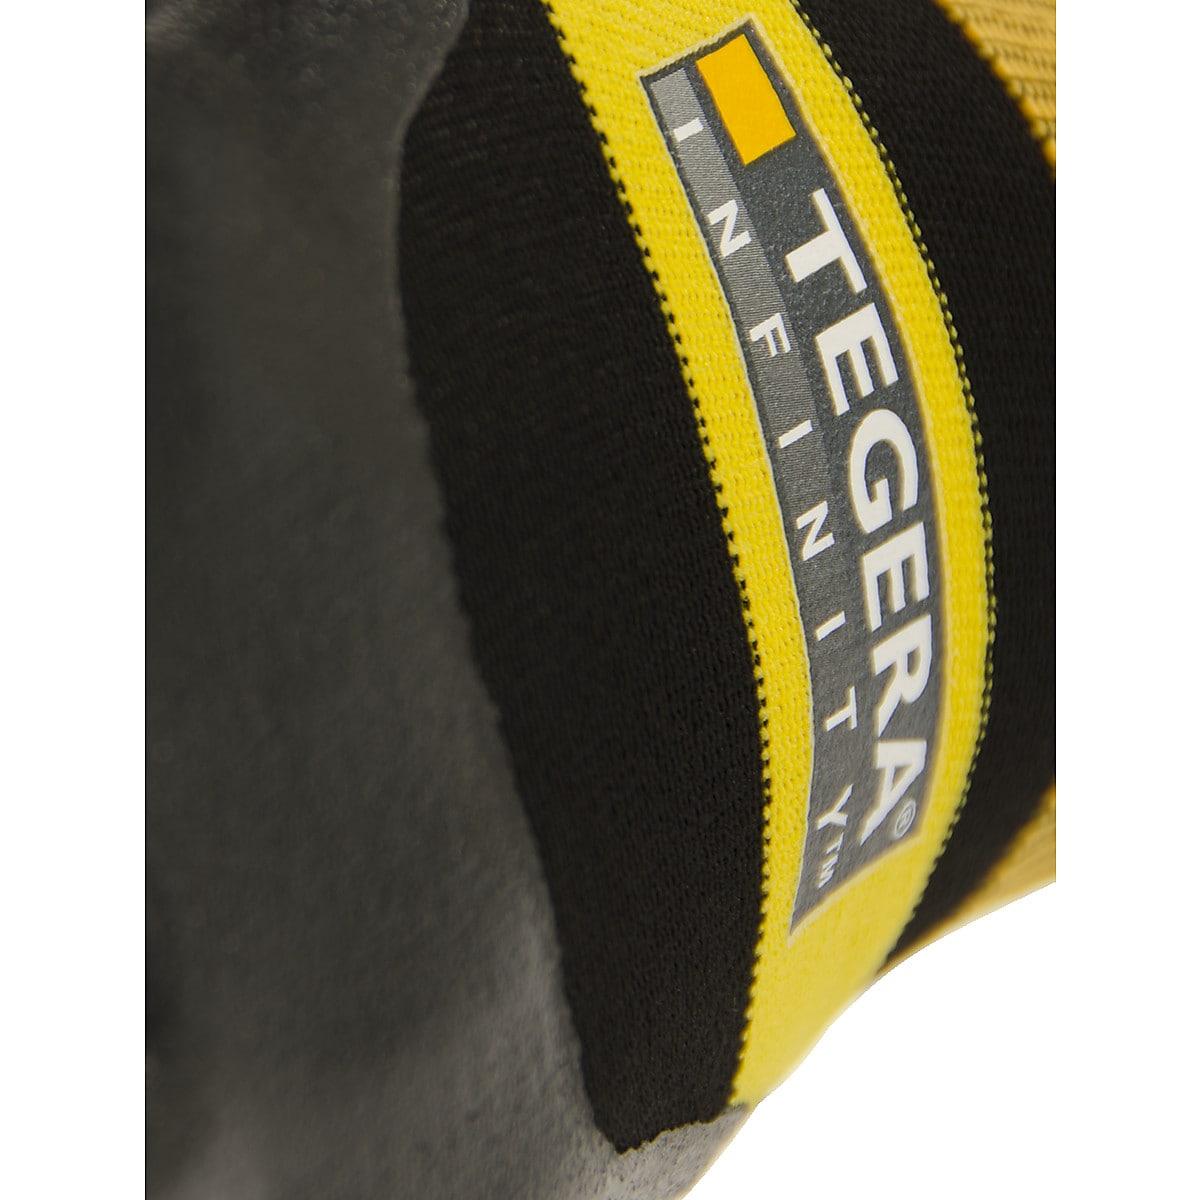 Handske Nitril Tegera 8803